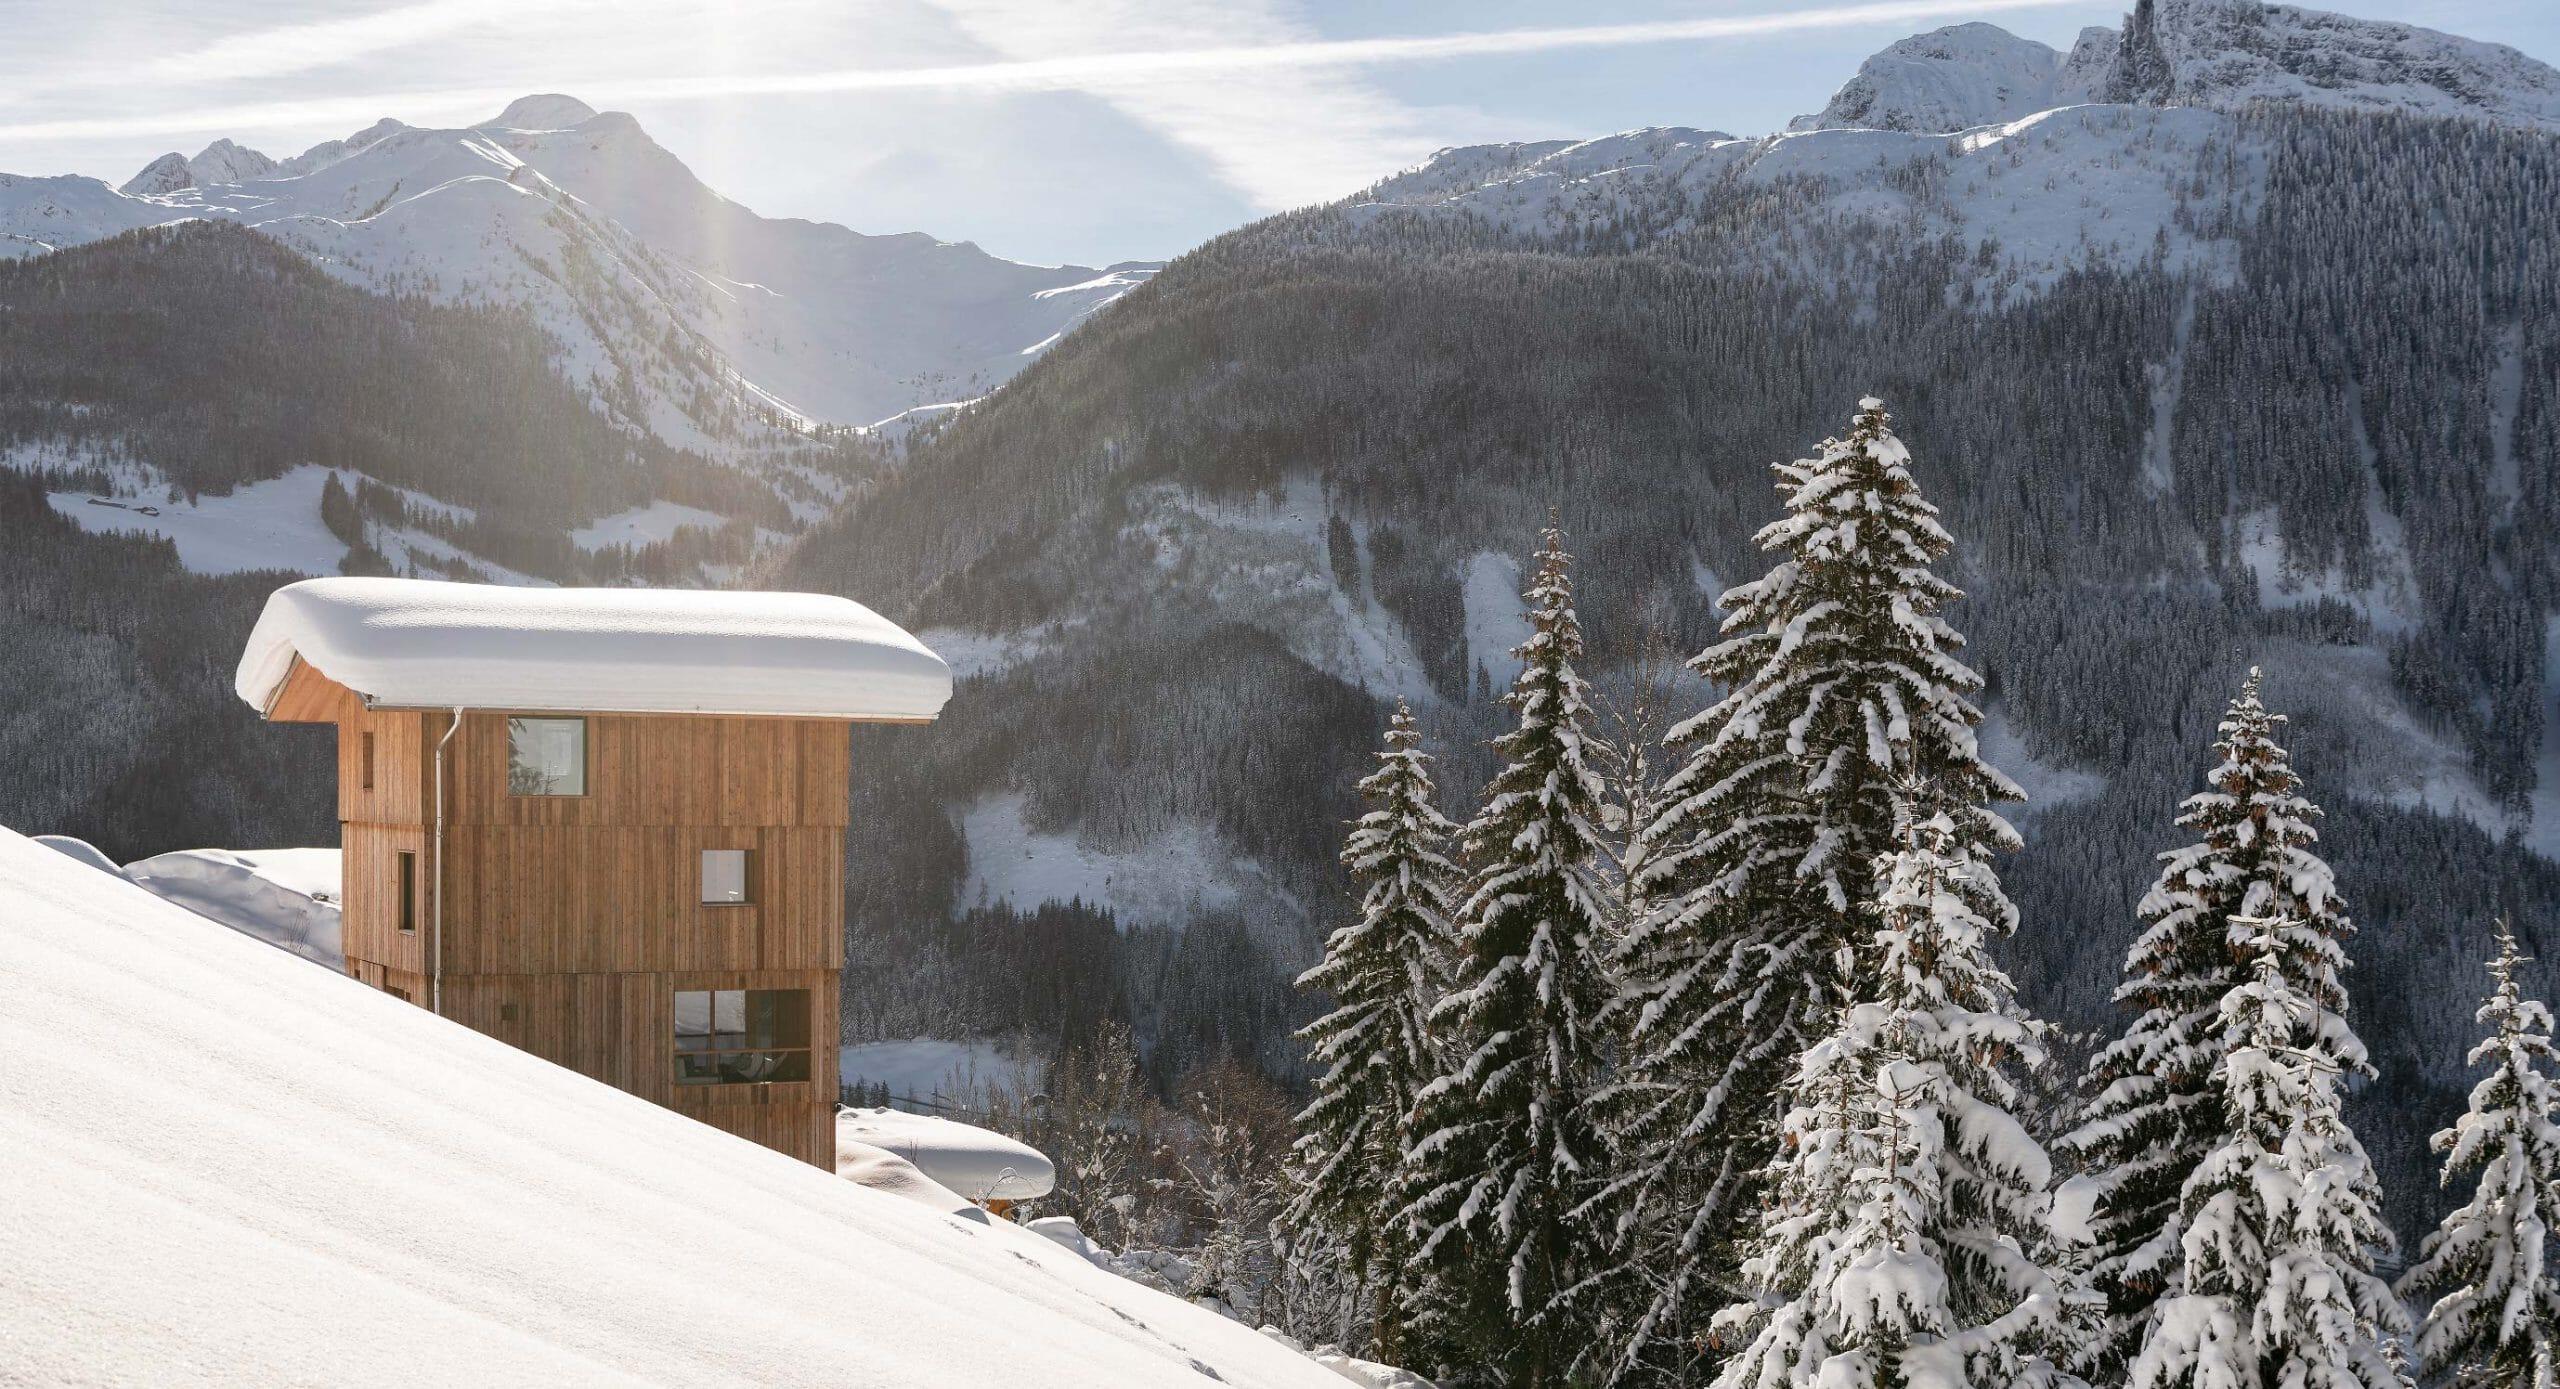 Turmhaus Tirol: Architecture against the elements